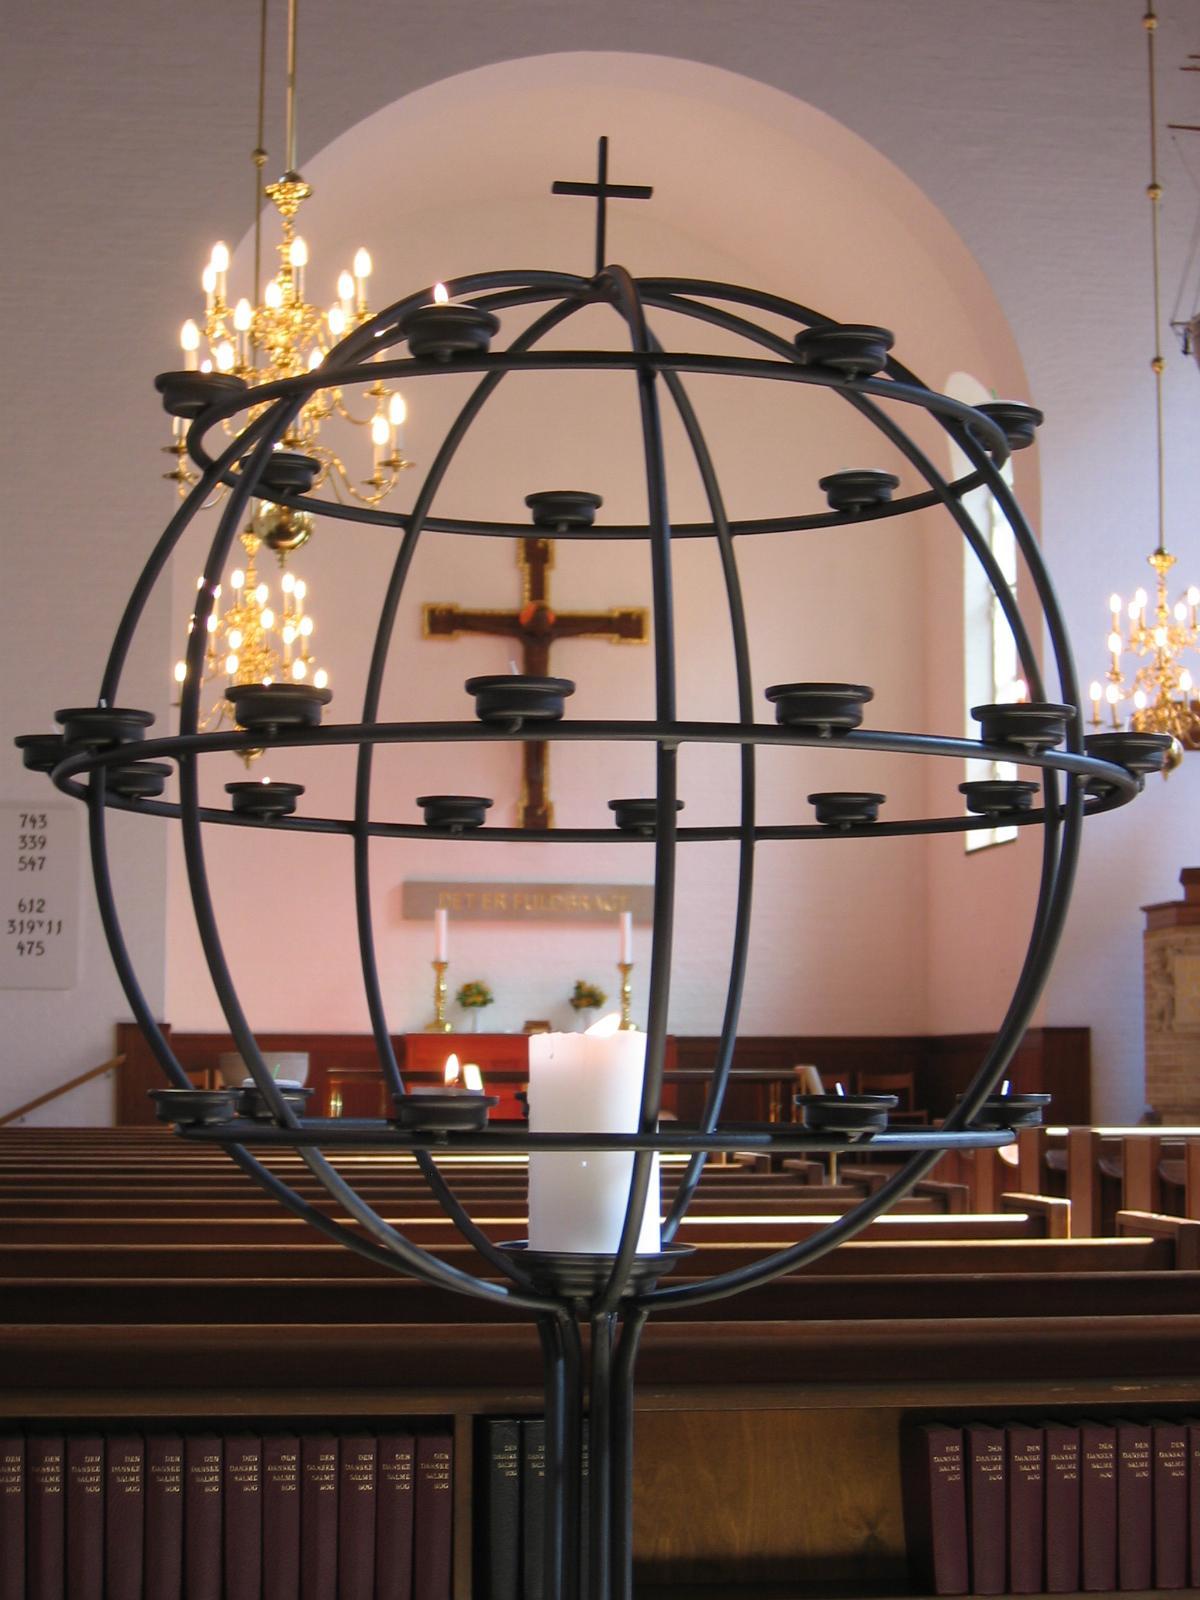 Lysglobe Absalons kirke © kvindesmedien